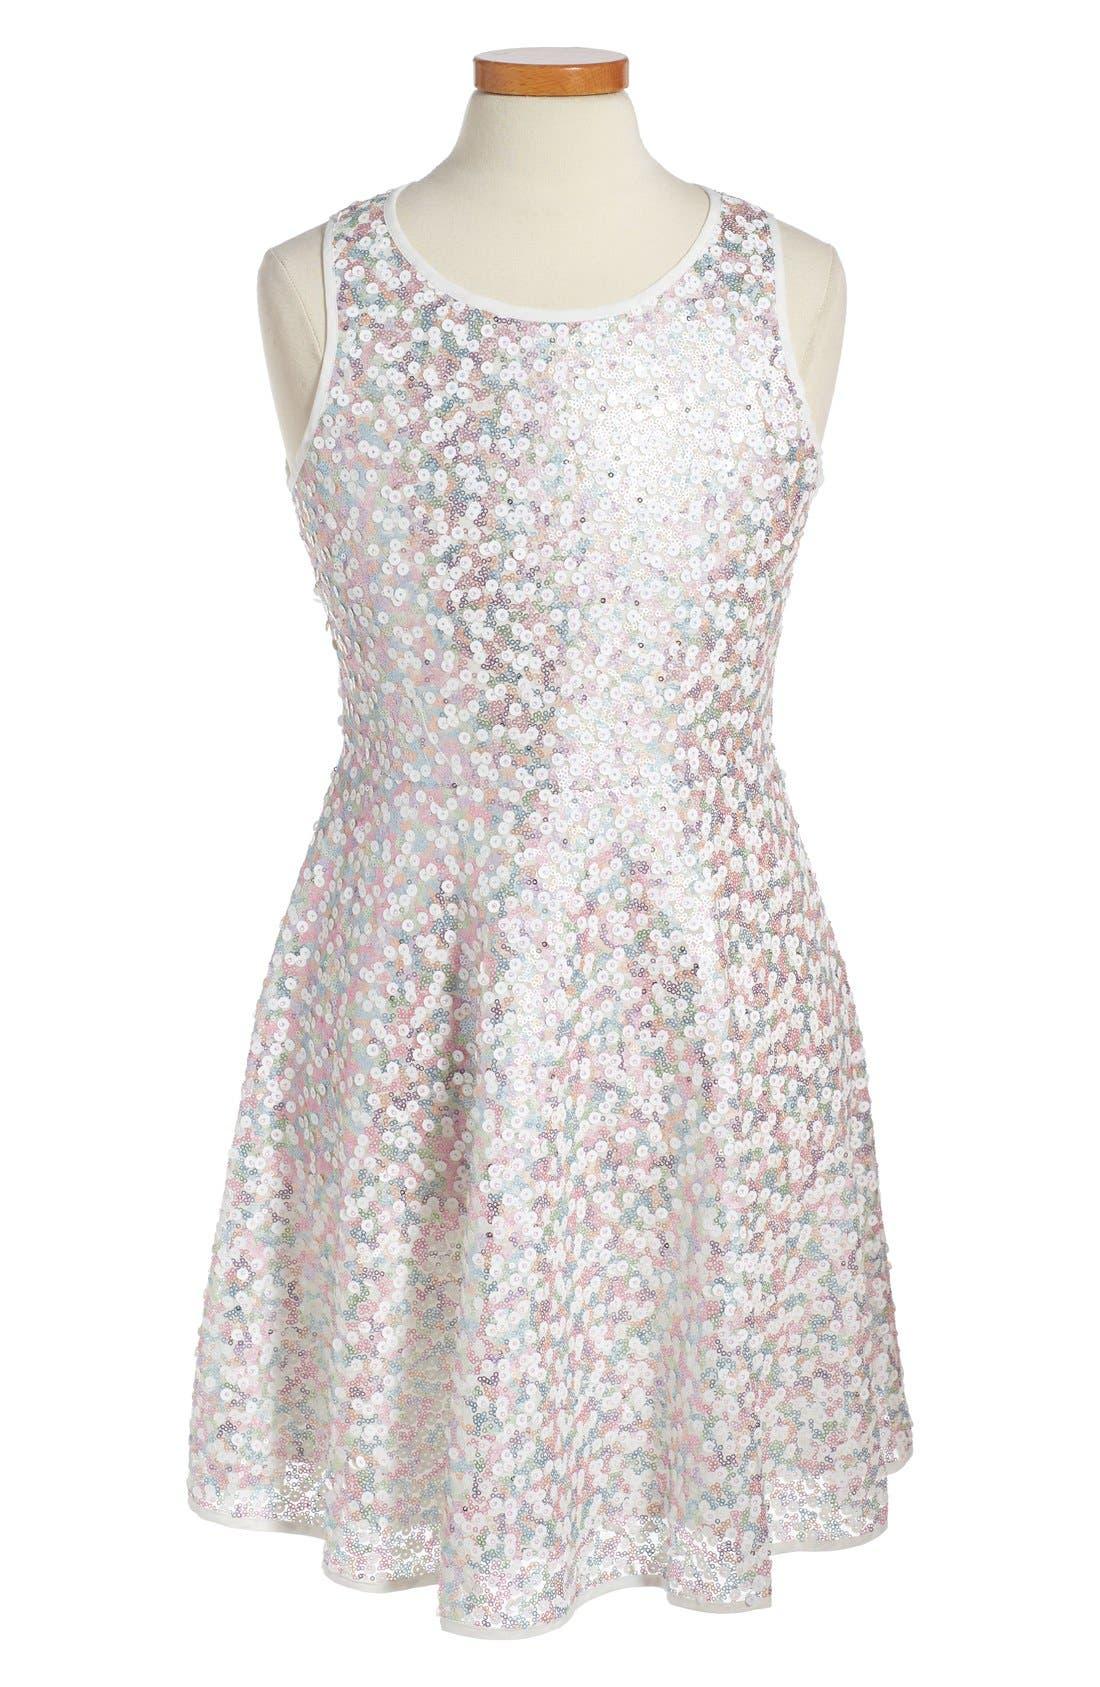 Alternate Image 1 Selected - Soprano 'Aurora' Sequin Skater Dress (Big Girls)